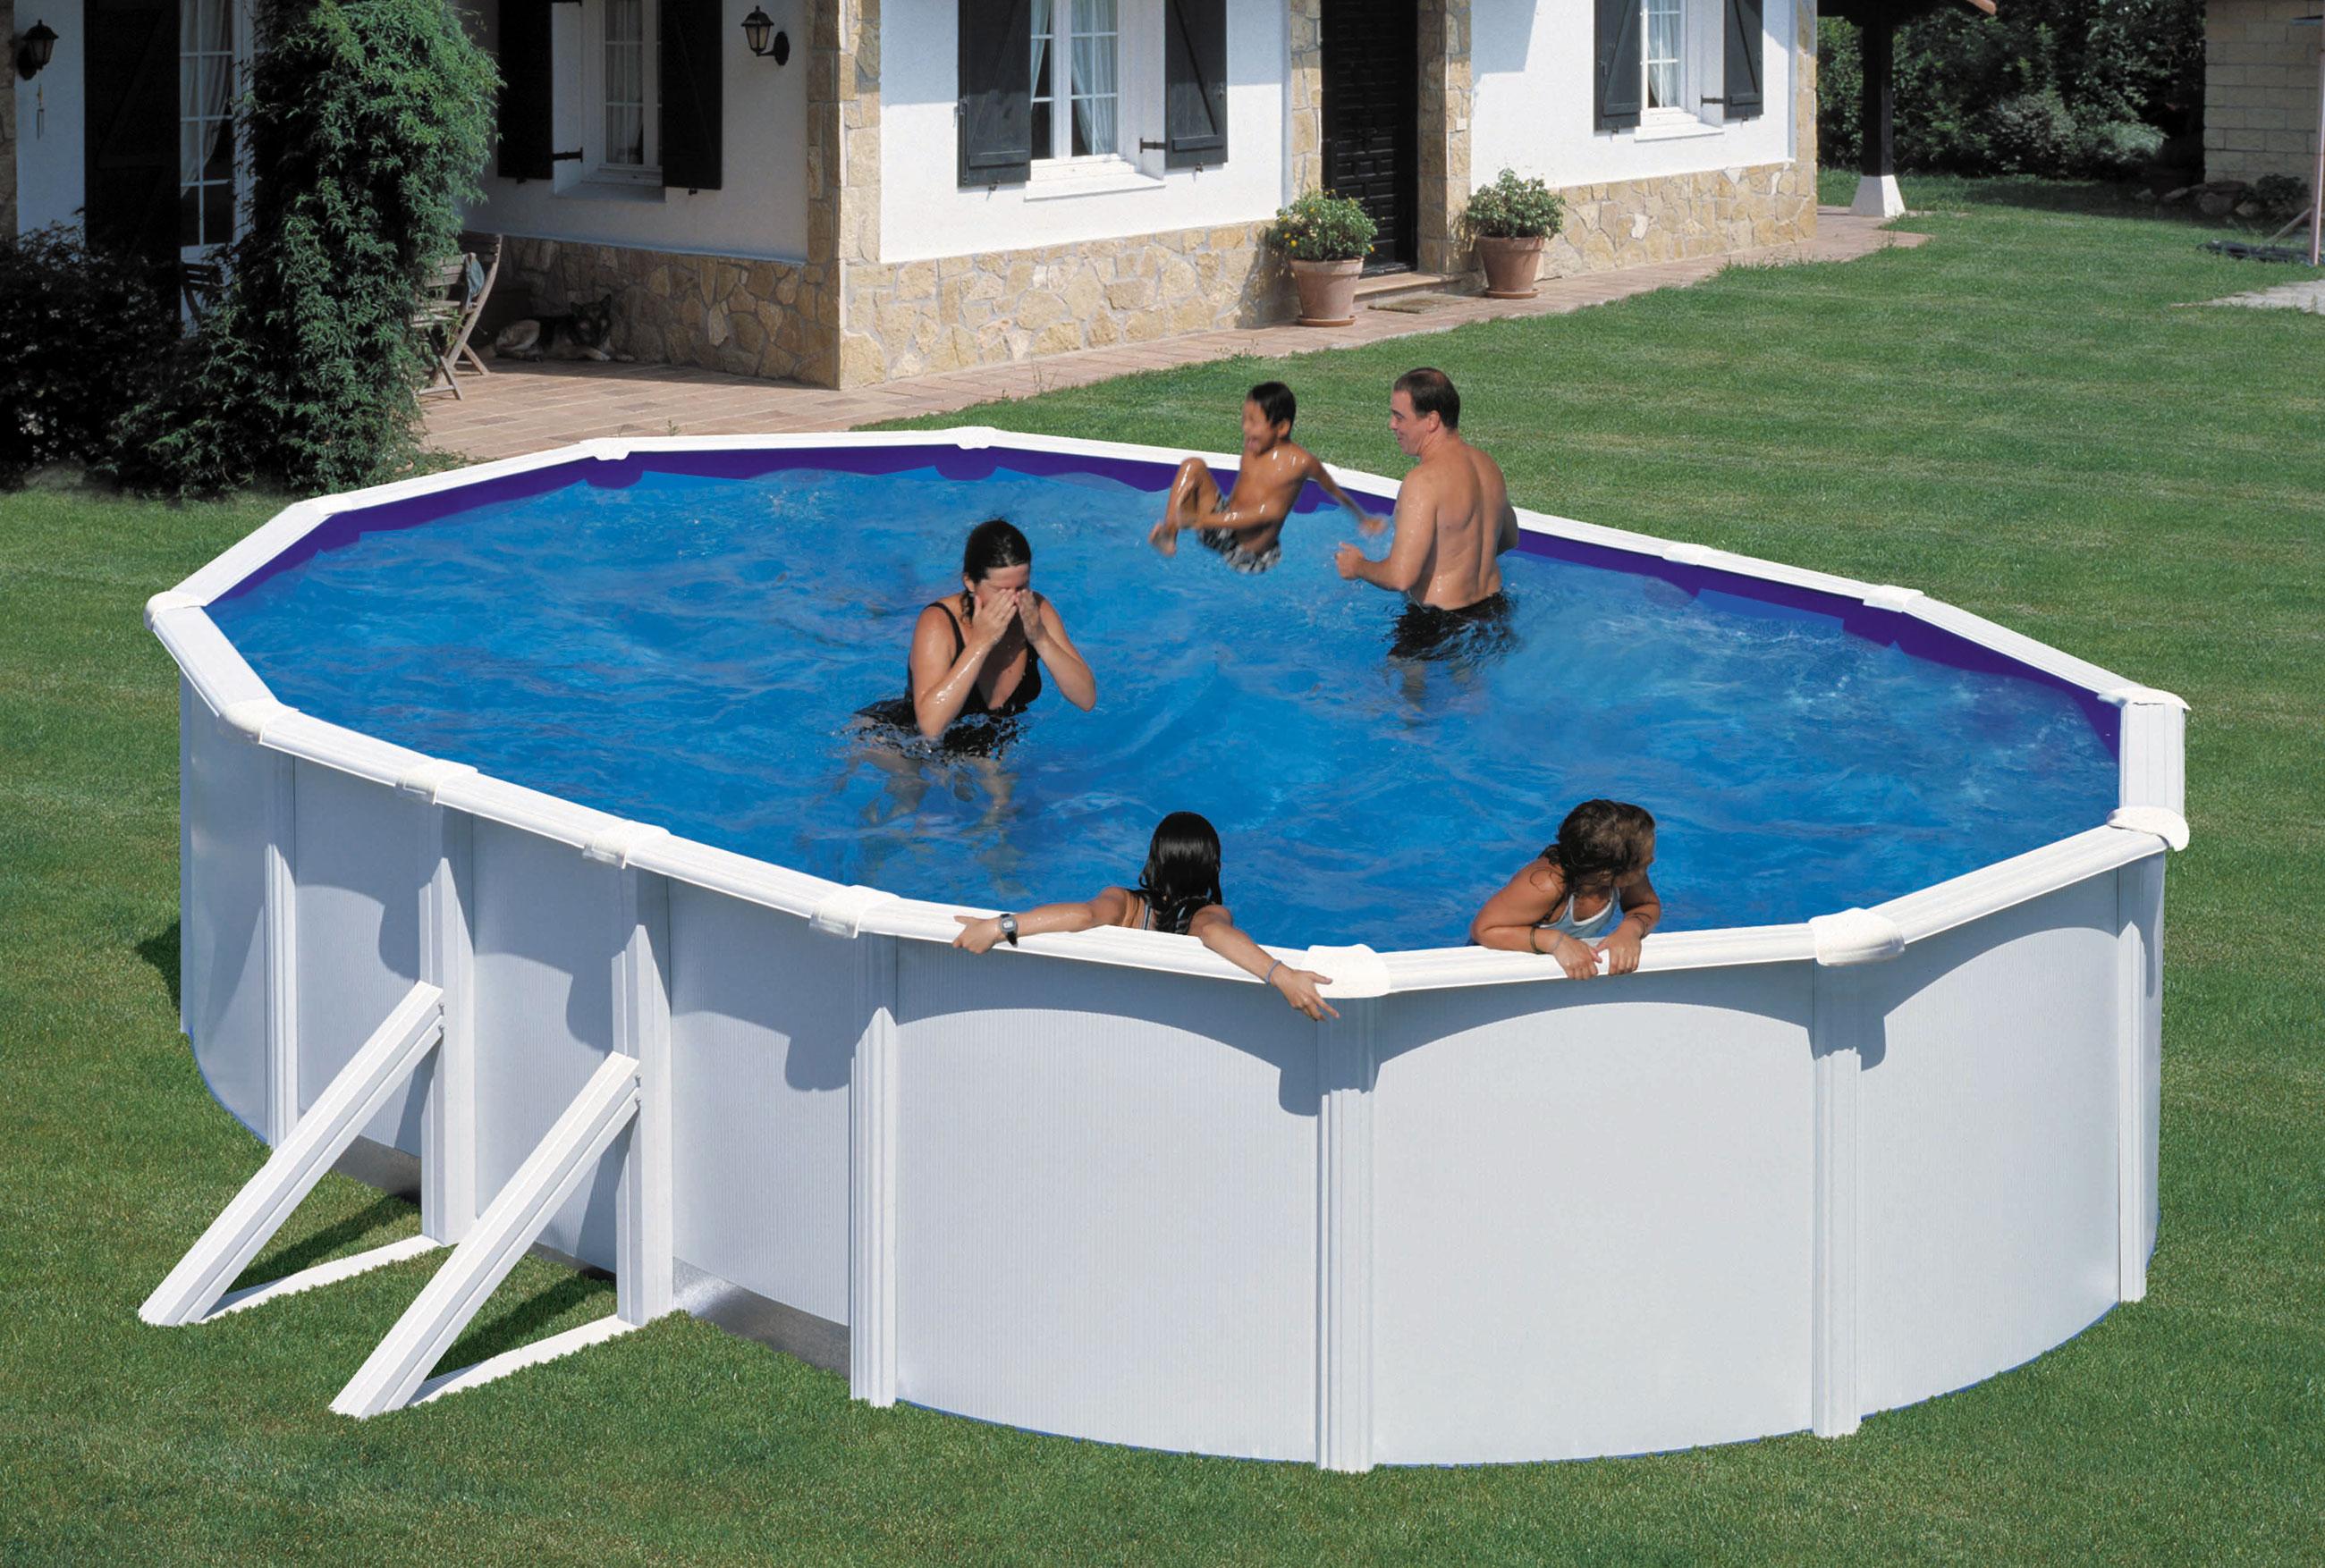 pool schwimmbecken feeling wei oval mit sandfilter. Black Bedroom Furniture Sets. Home Design Ideas